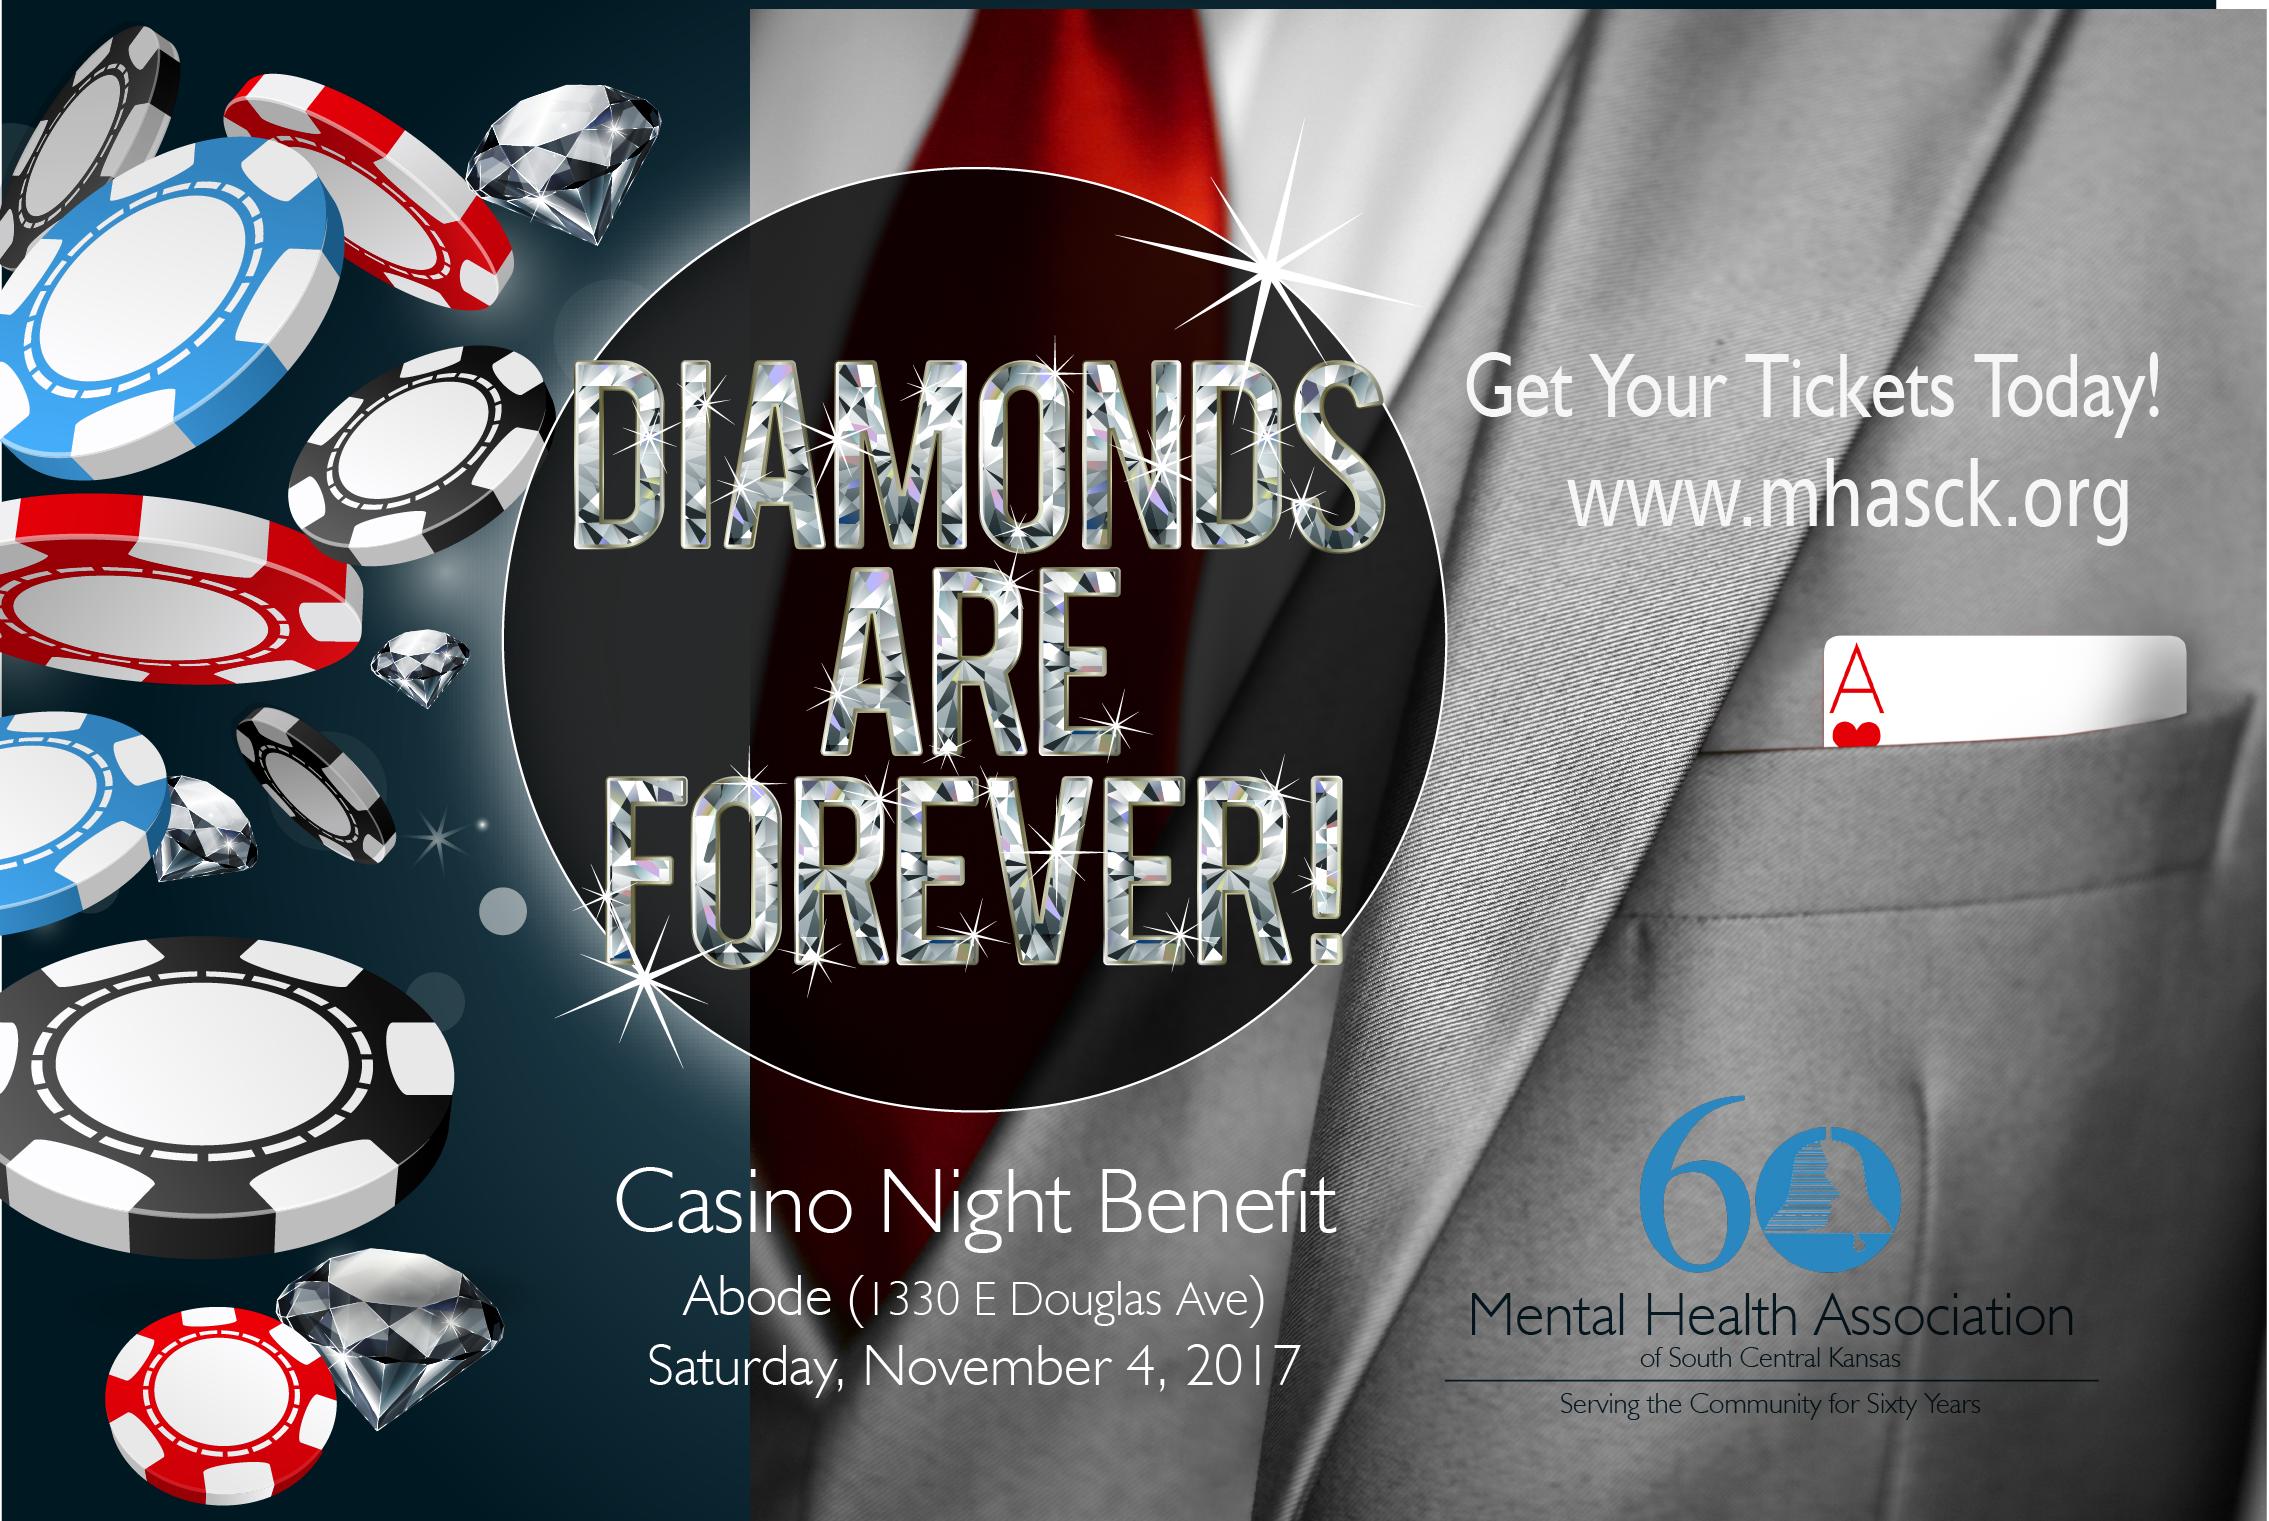 Diamonds Are Forever Casino Night Event